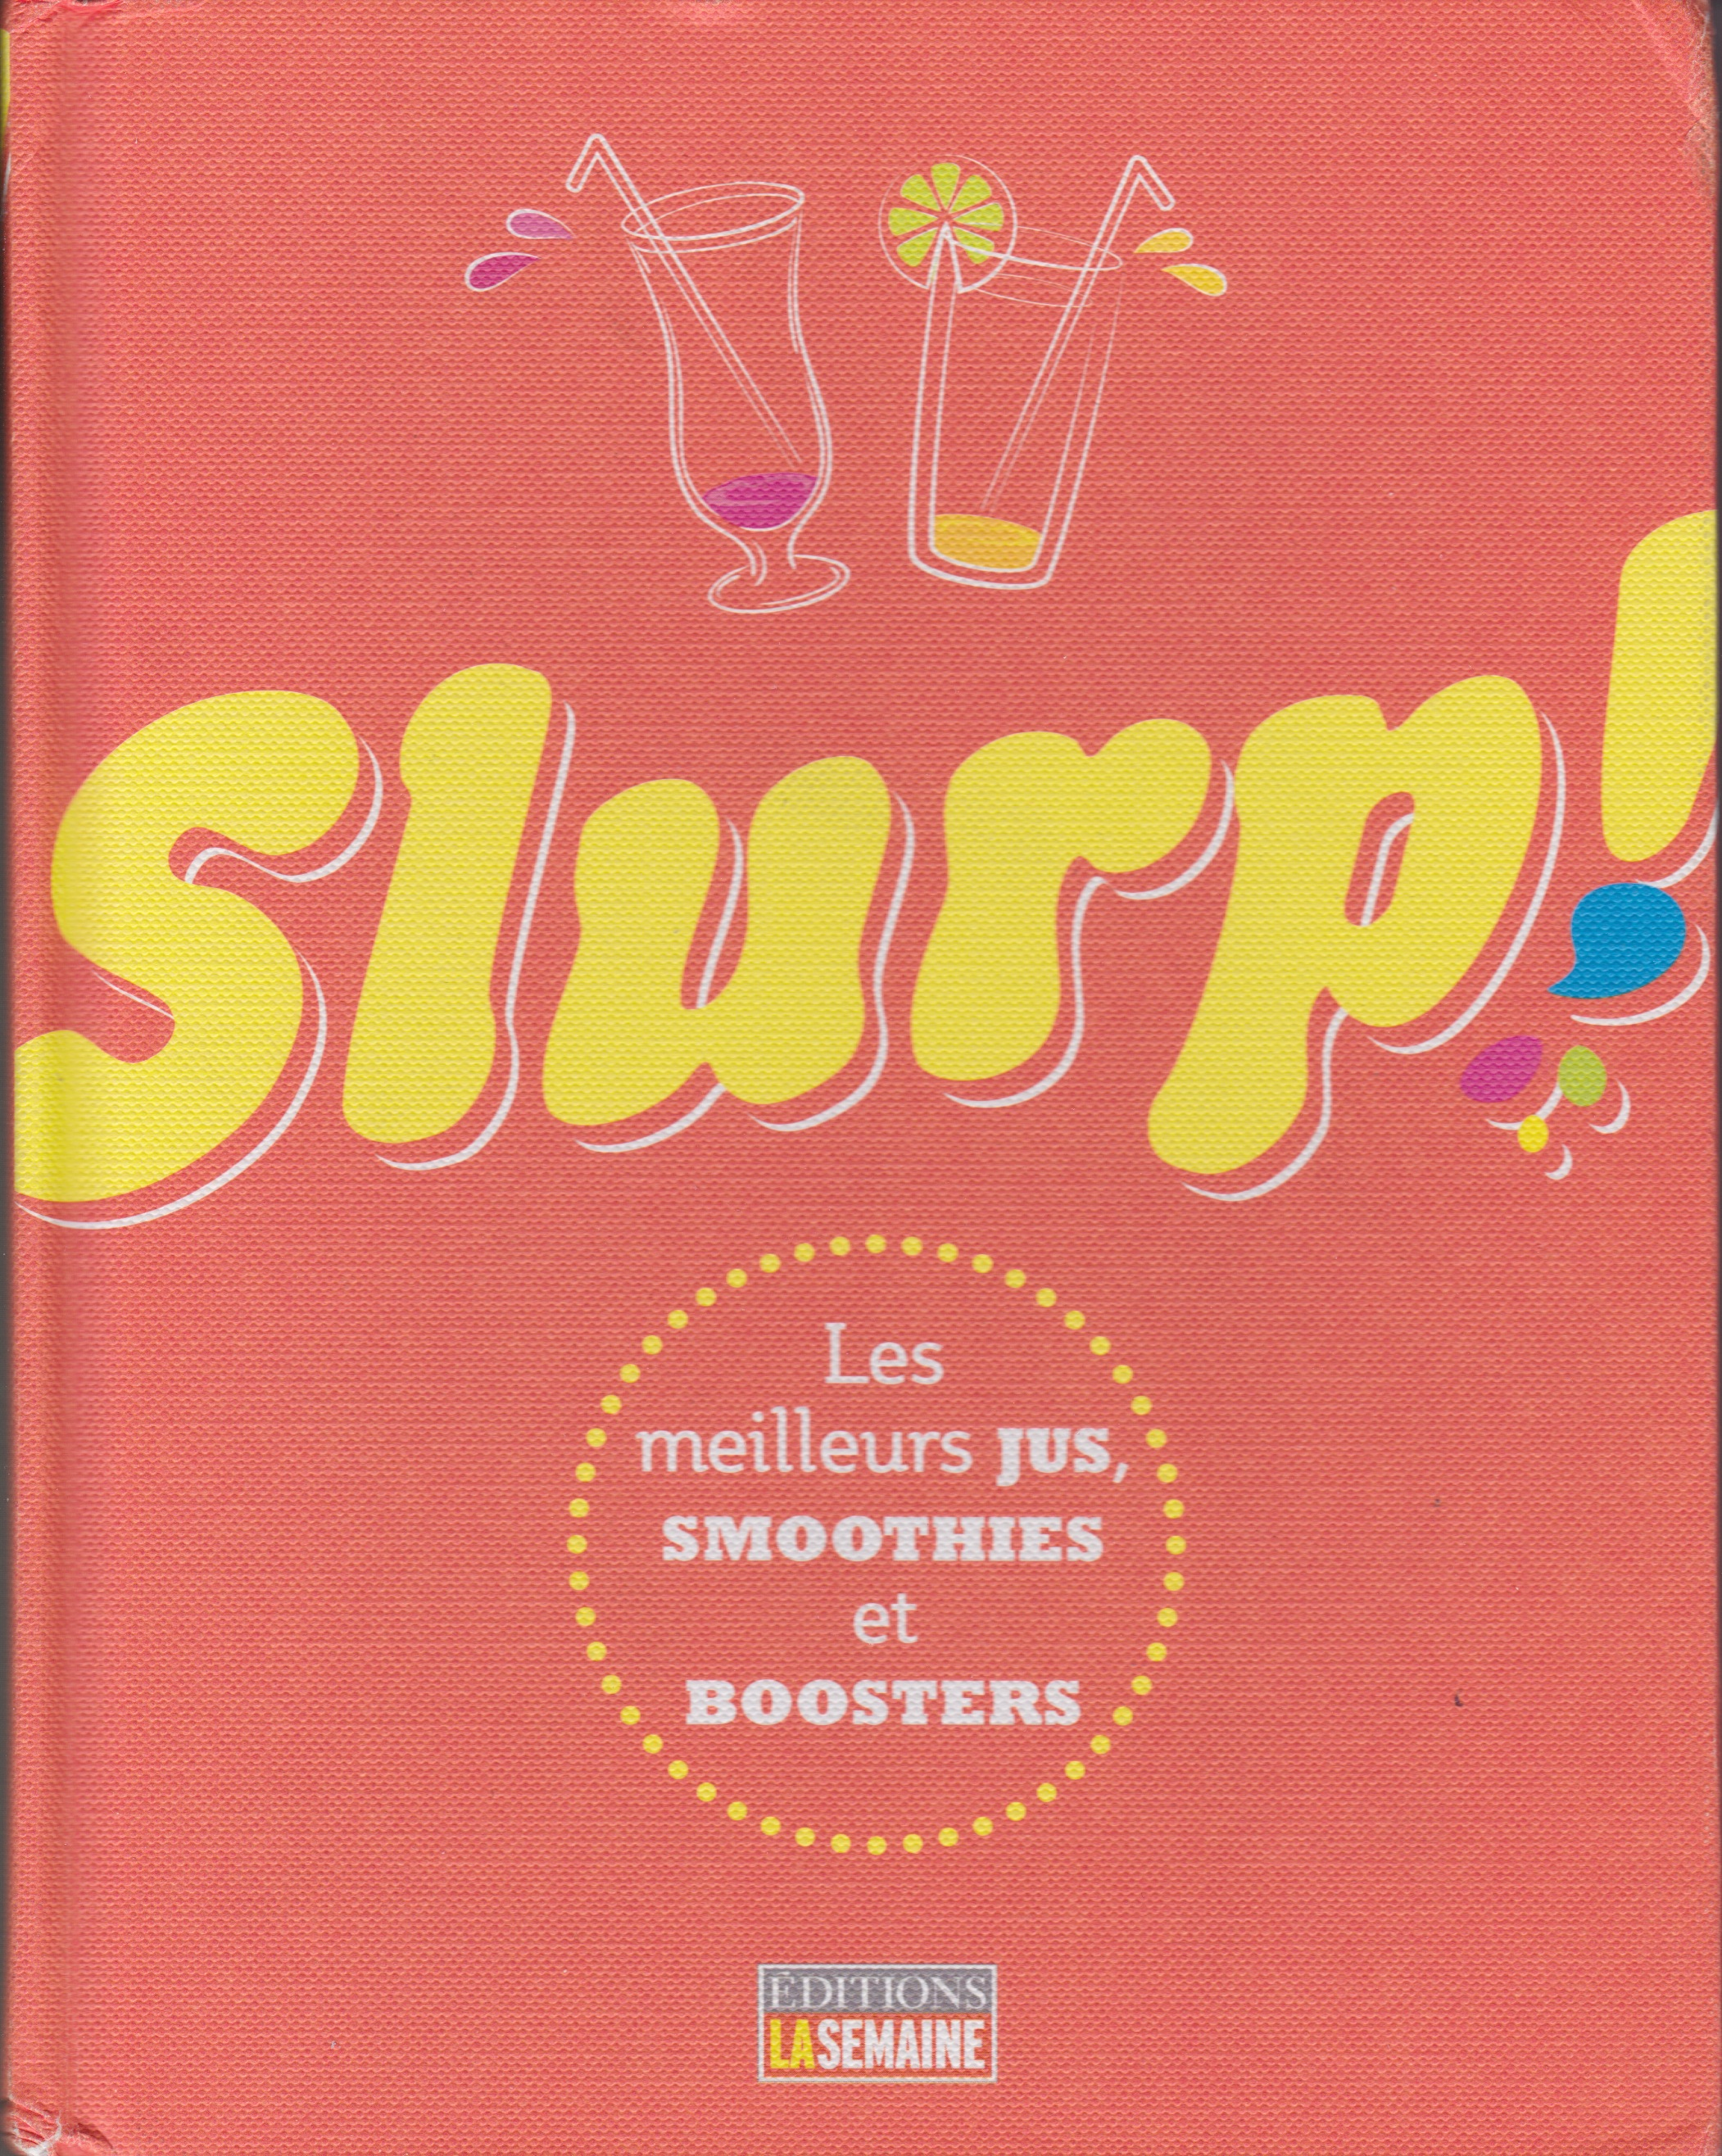 Slurp! Jus, smoothies et boosters